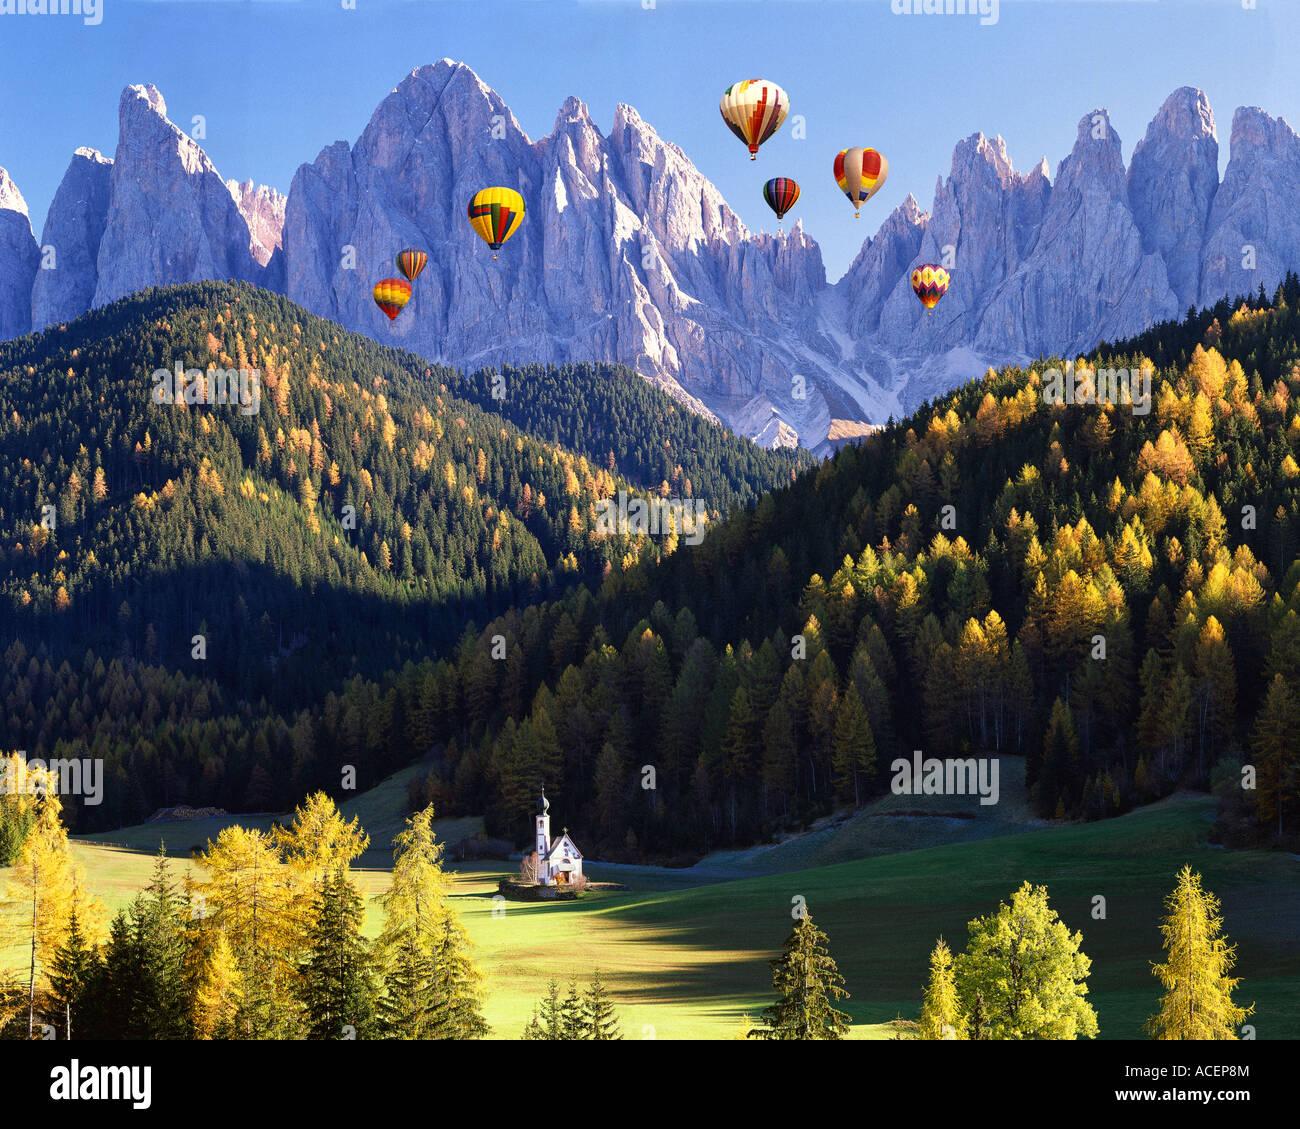 Es - Dolomiten: St. Johann in ranui und geisler spitzen Berge Stockbild